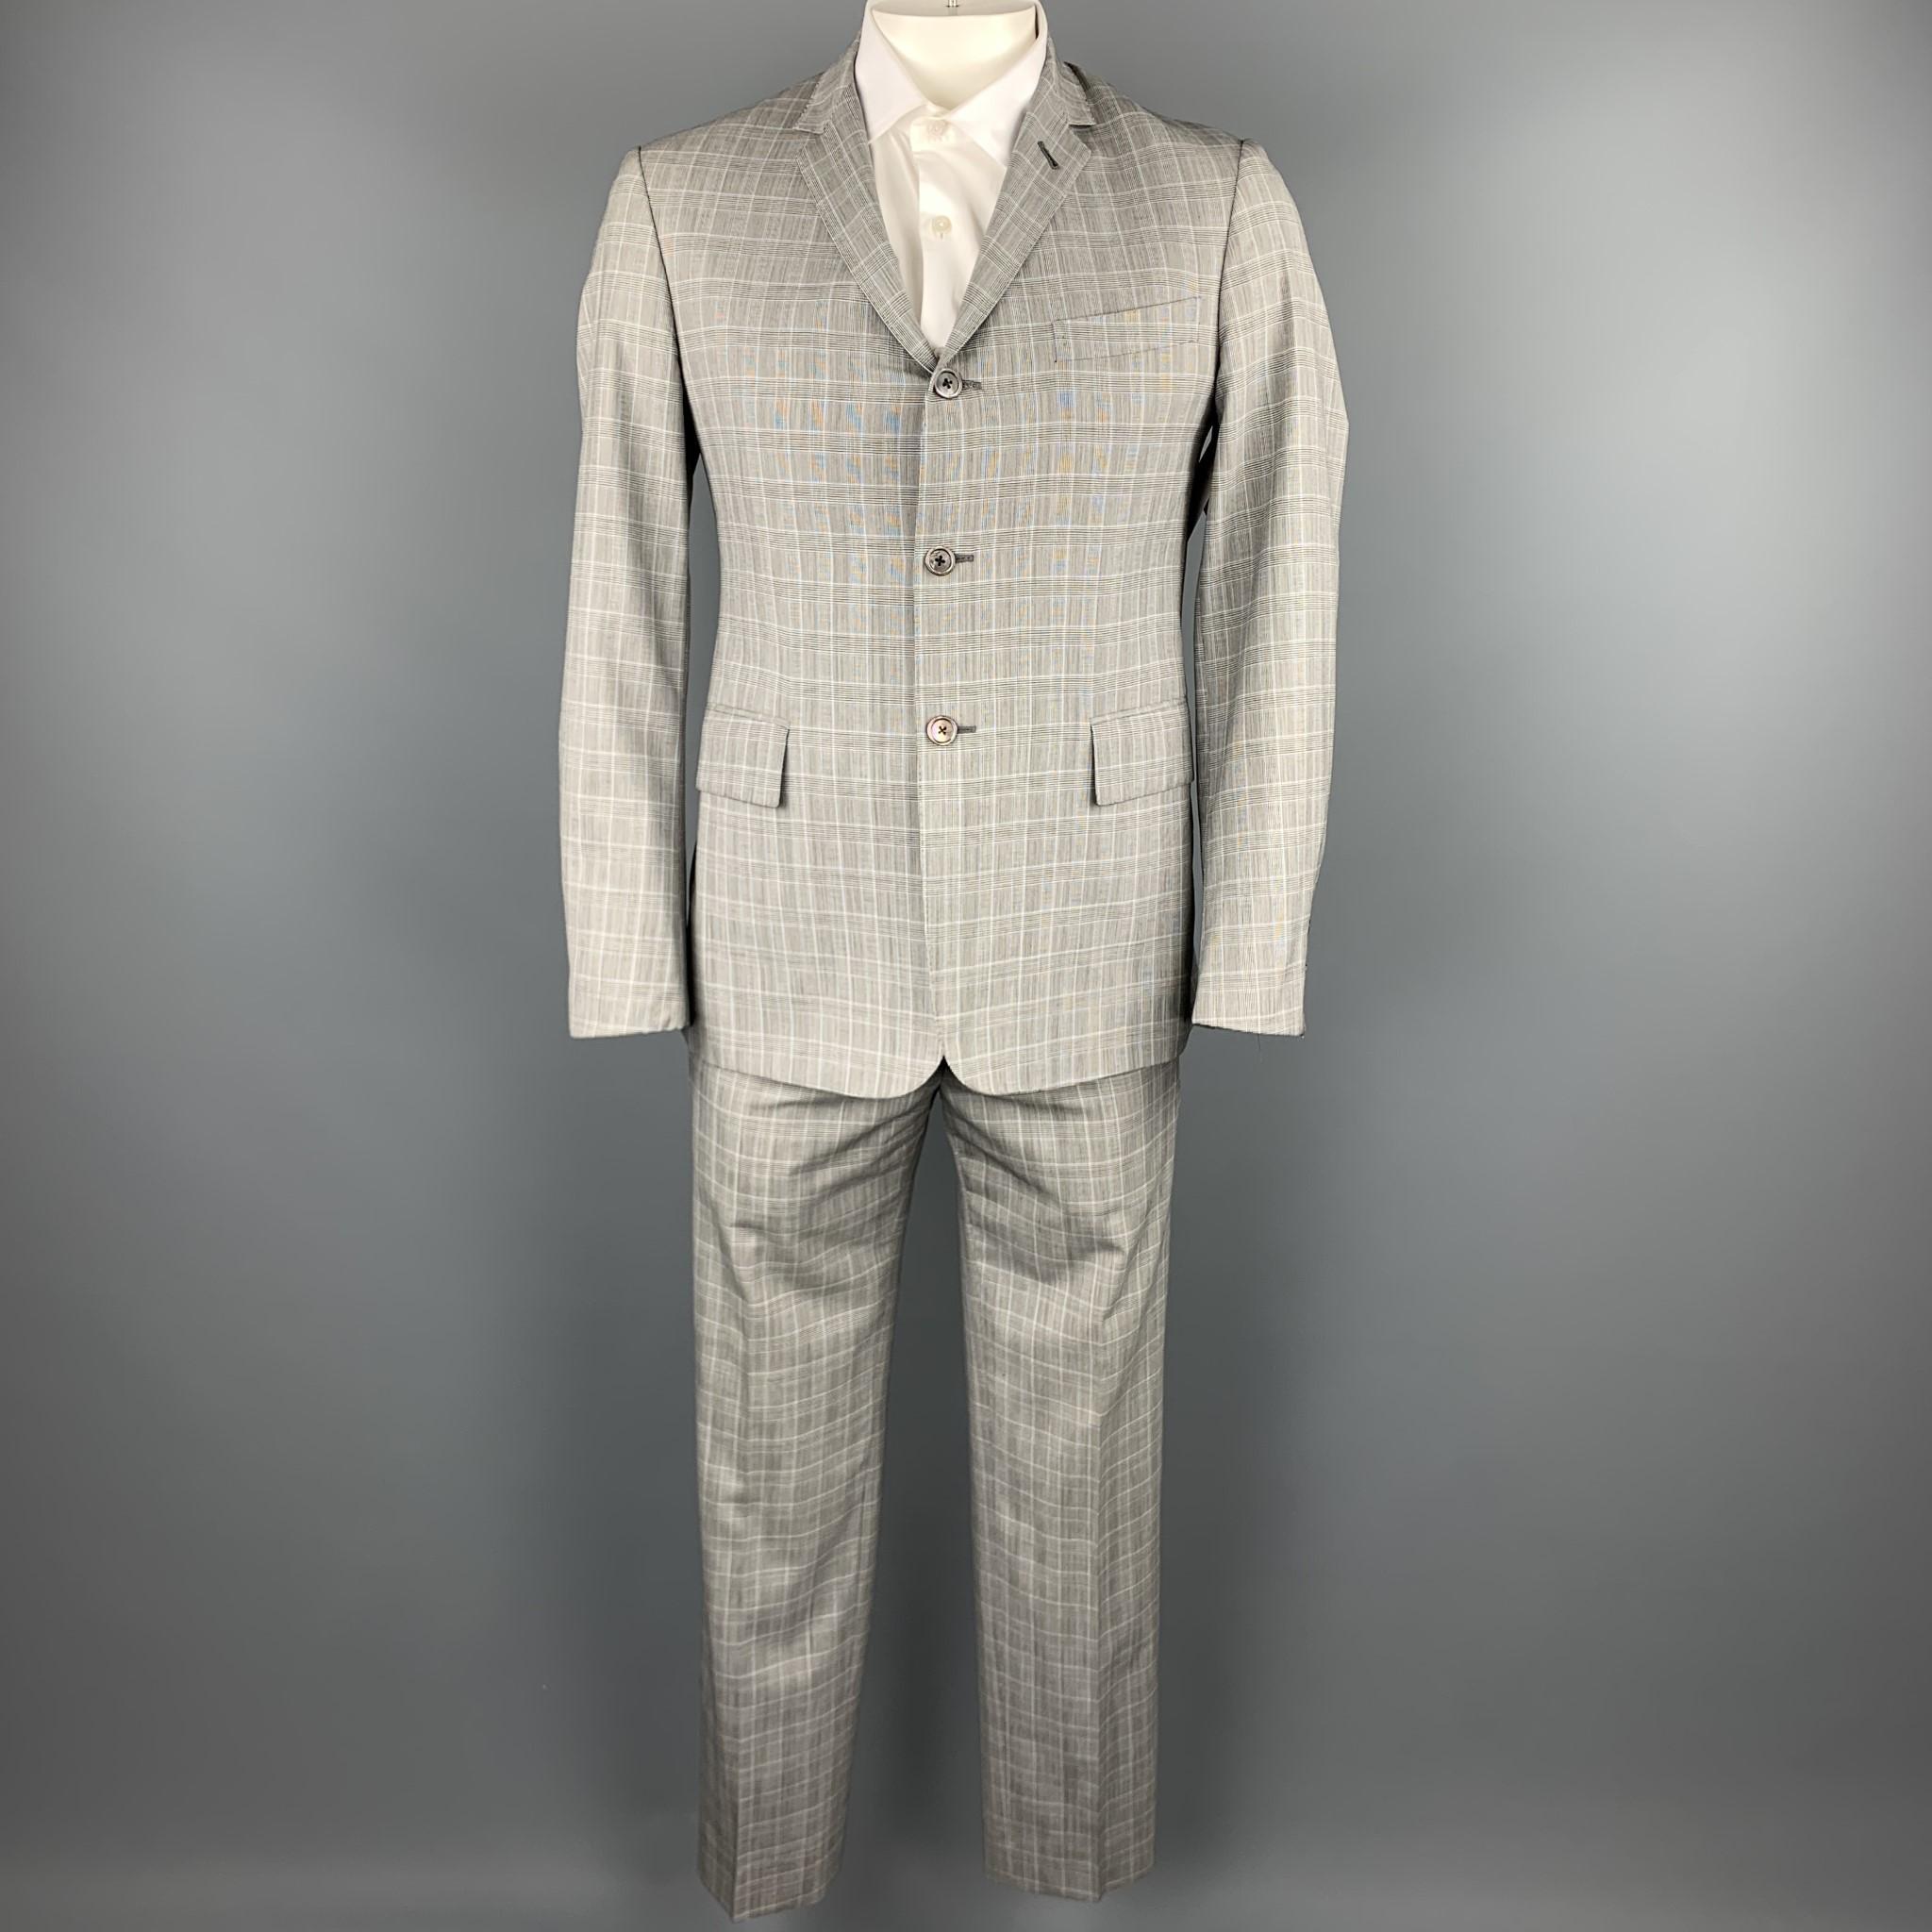 BLACK FLEECE Size 40 / BB2 Grey Glen plaid Wool Notch Lapel Suit